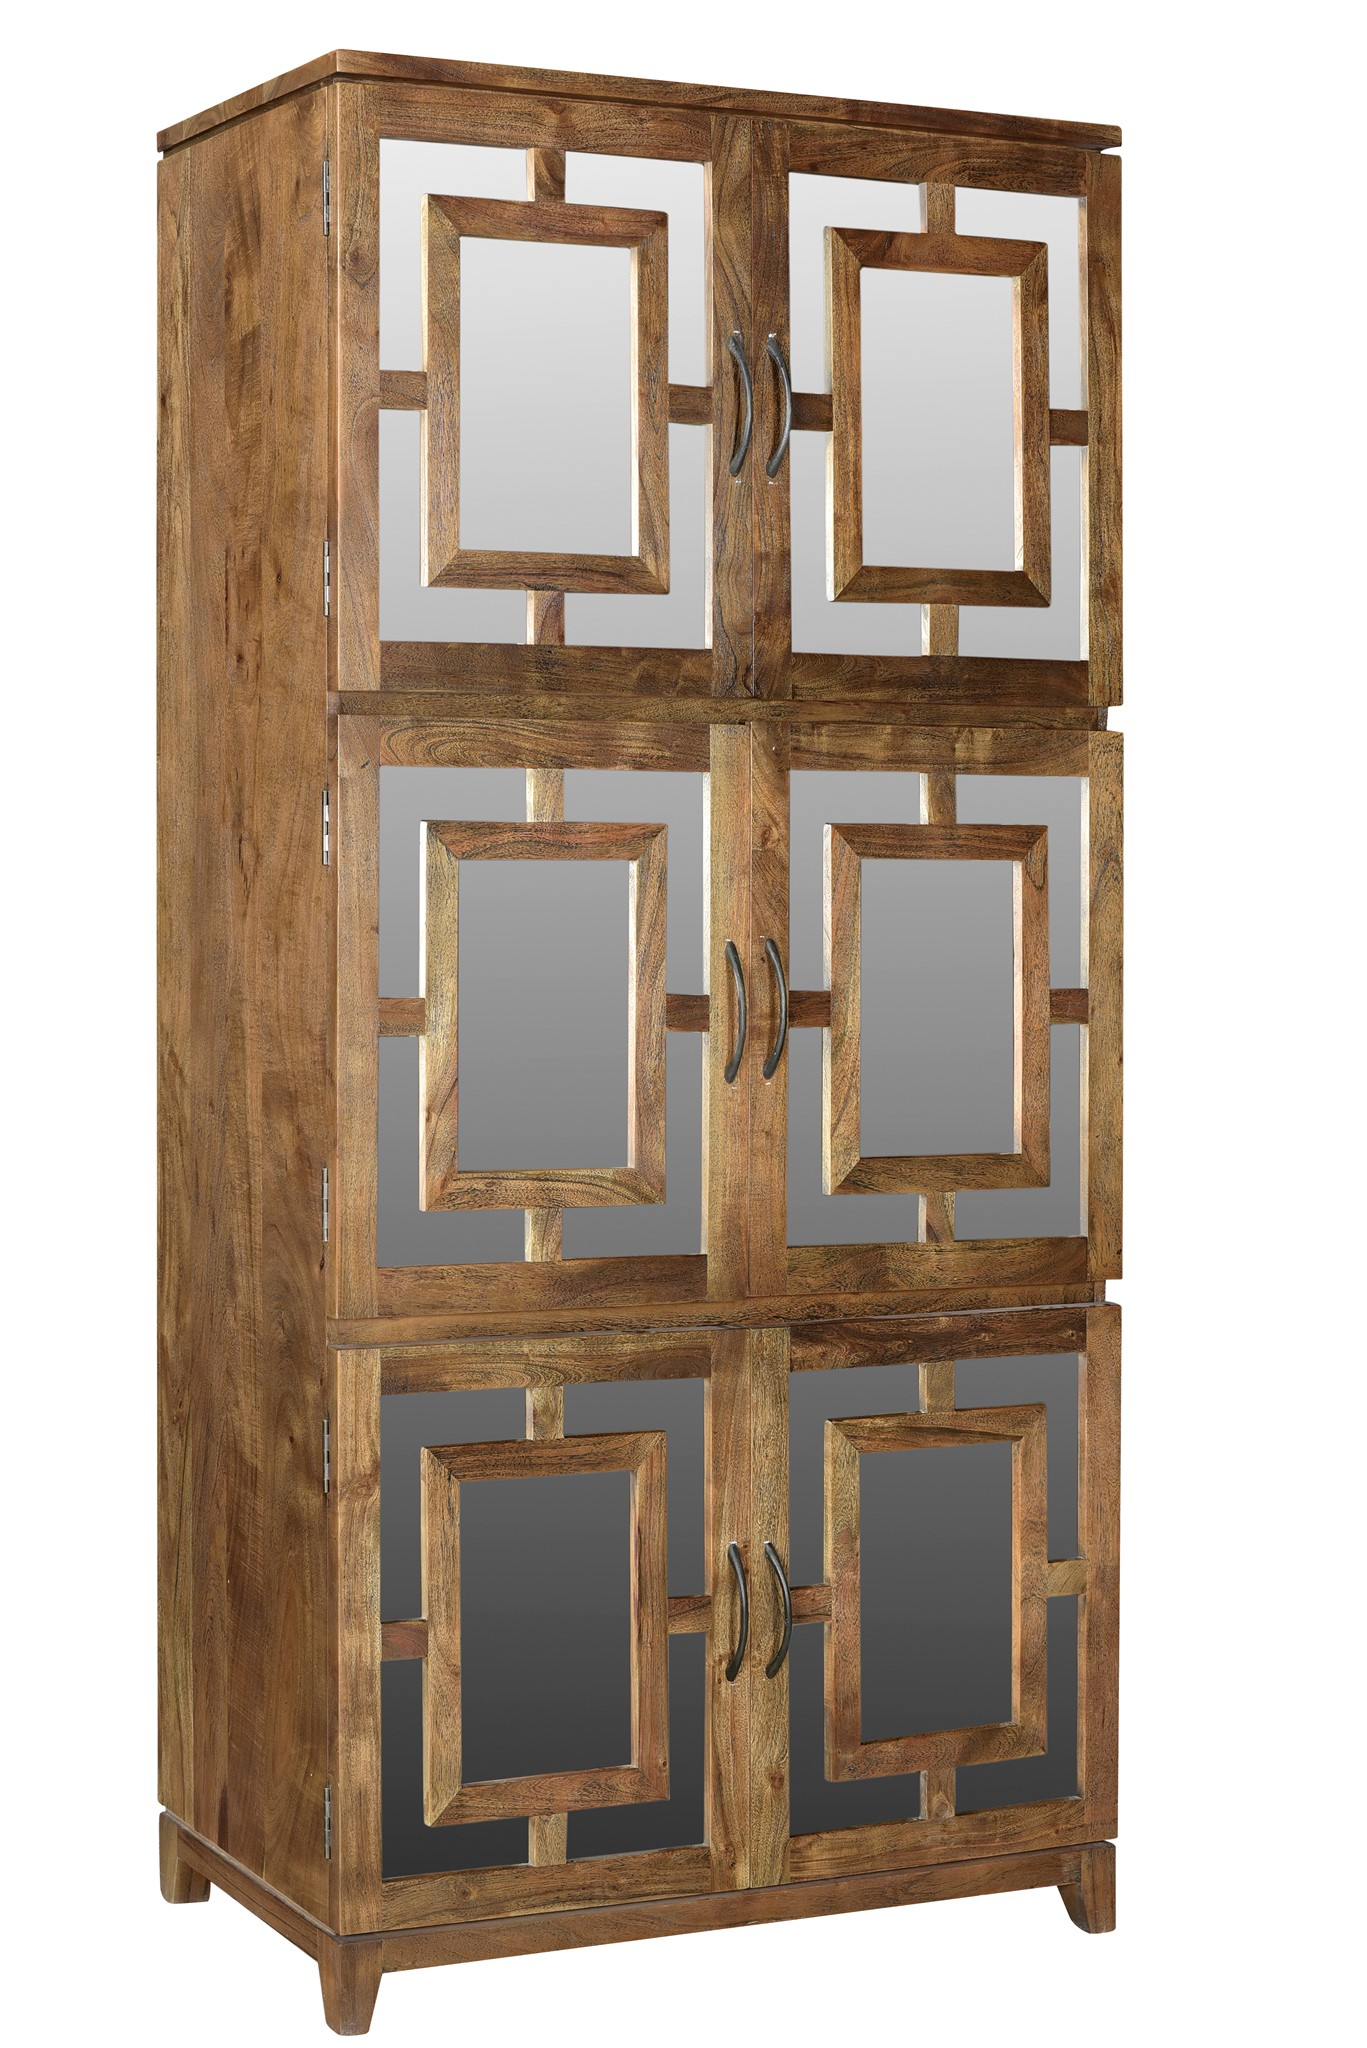 Bengal Manor Acacia Wood 6 Door Mirrored Tall Cabinet CVFNR463